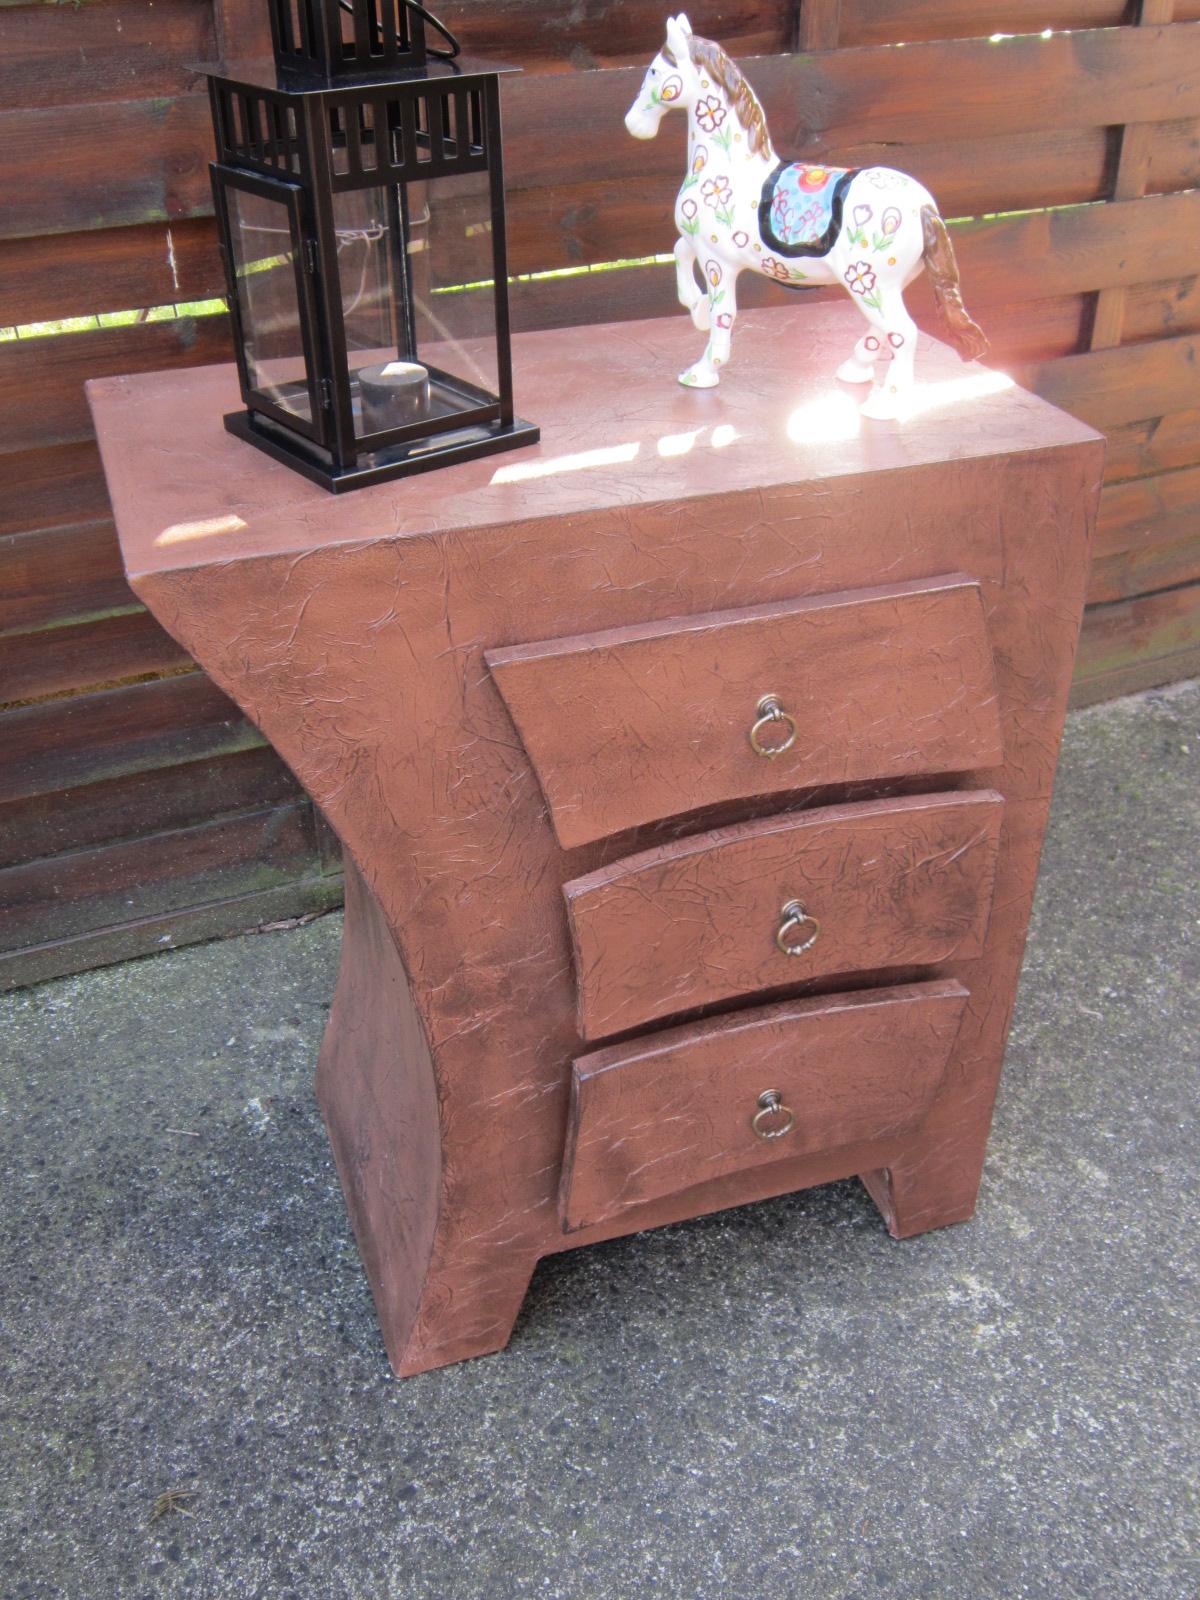 meubles en carton archives cartonrecup. Black Bedroom Furniture Sets. Home Design Ideas